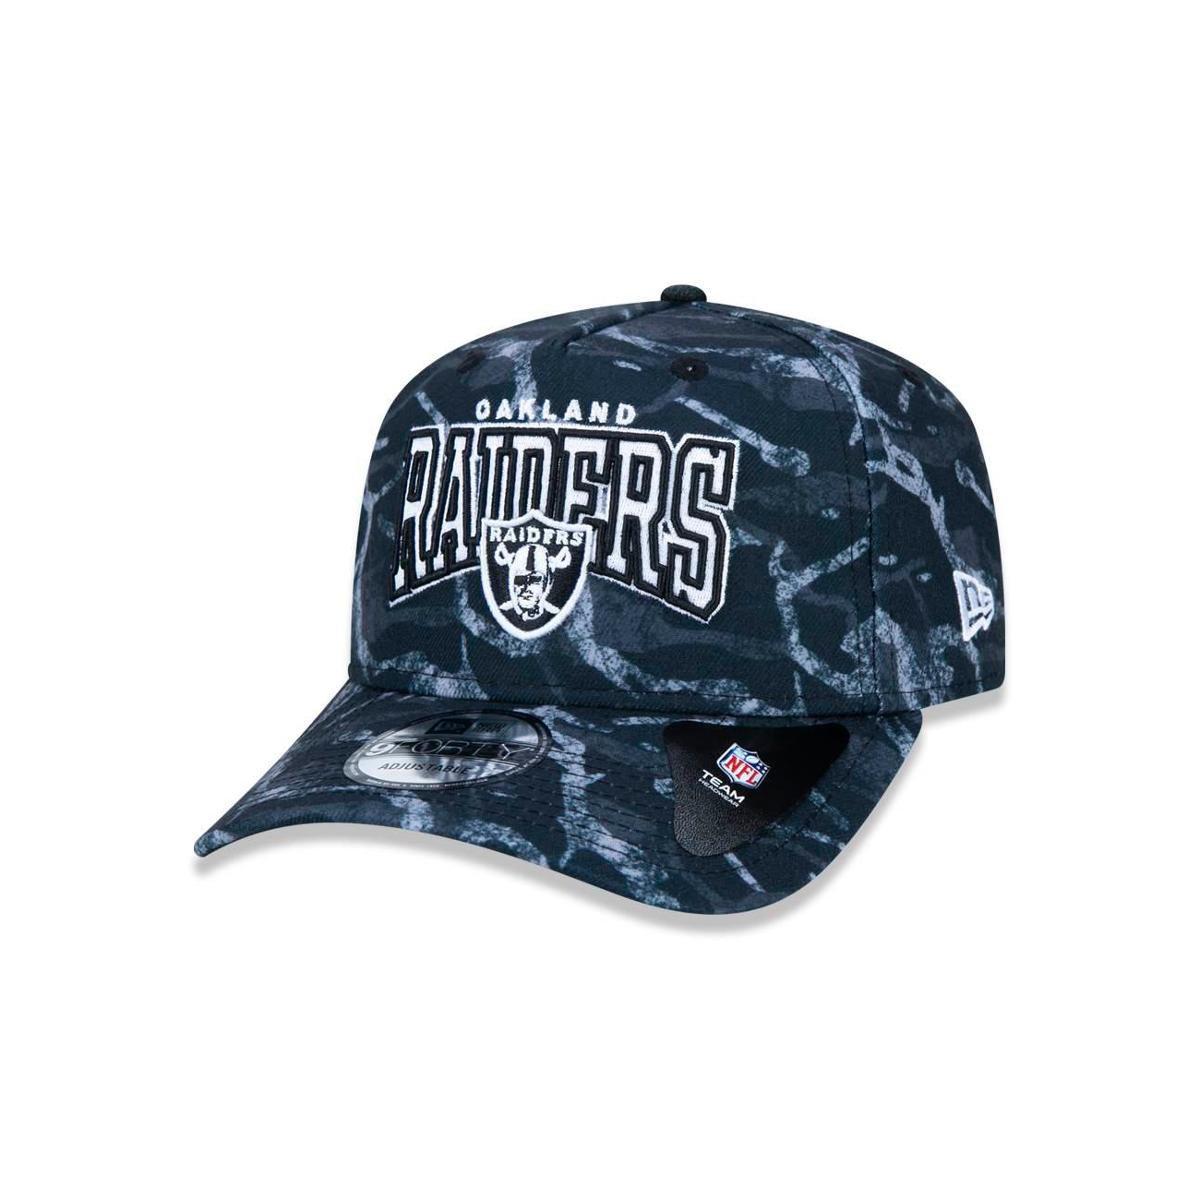 Boné 940 Oakland Raiders NFL Aba Curva New Era - Preto - Compre ... 97287f4f2a3